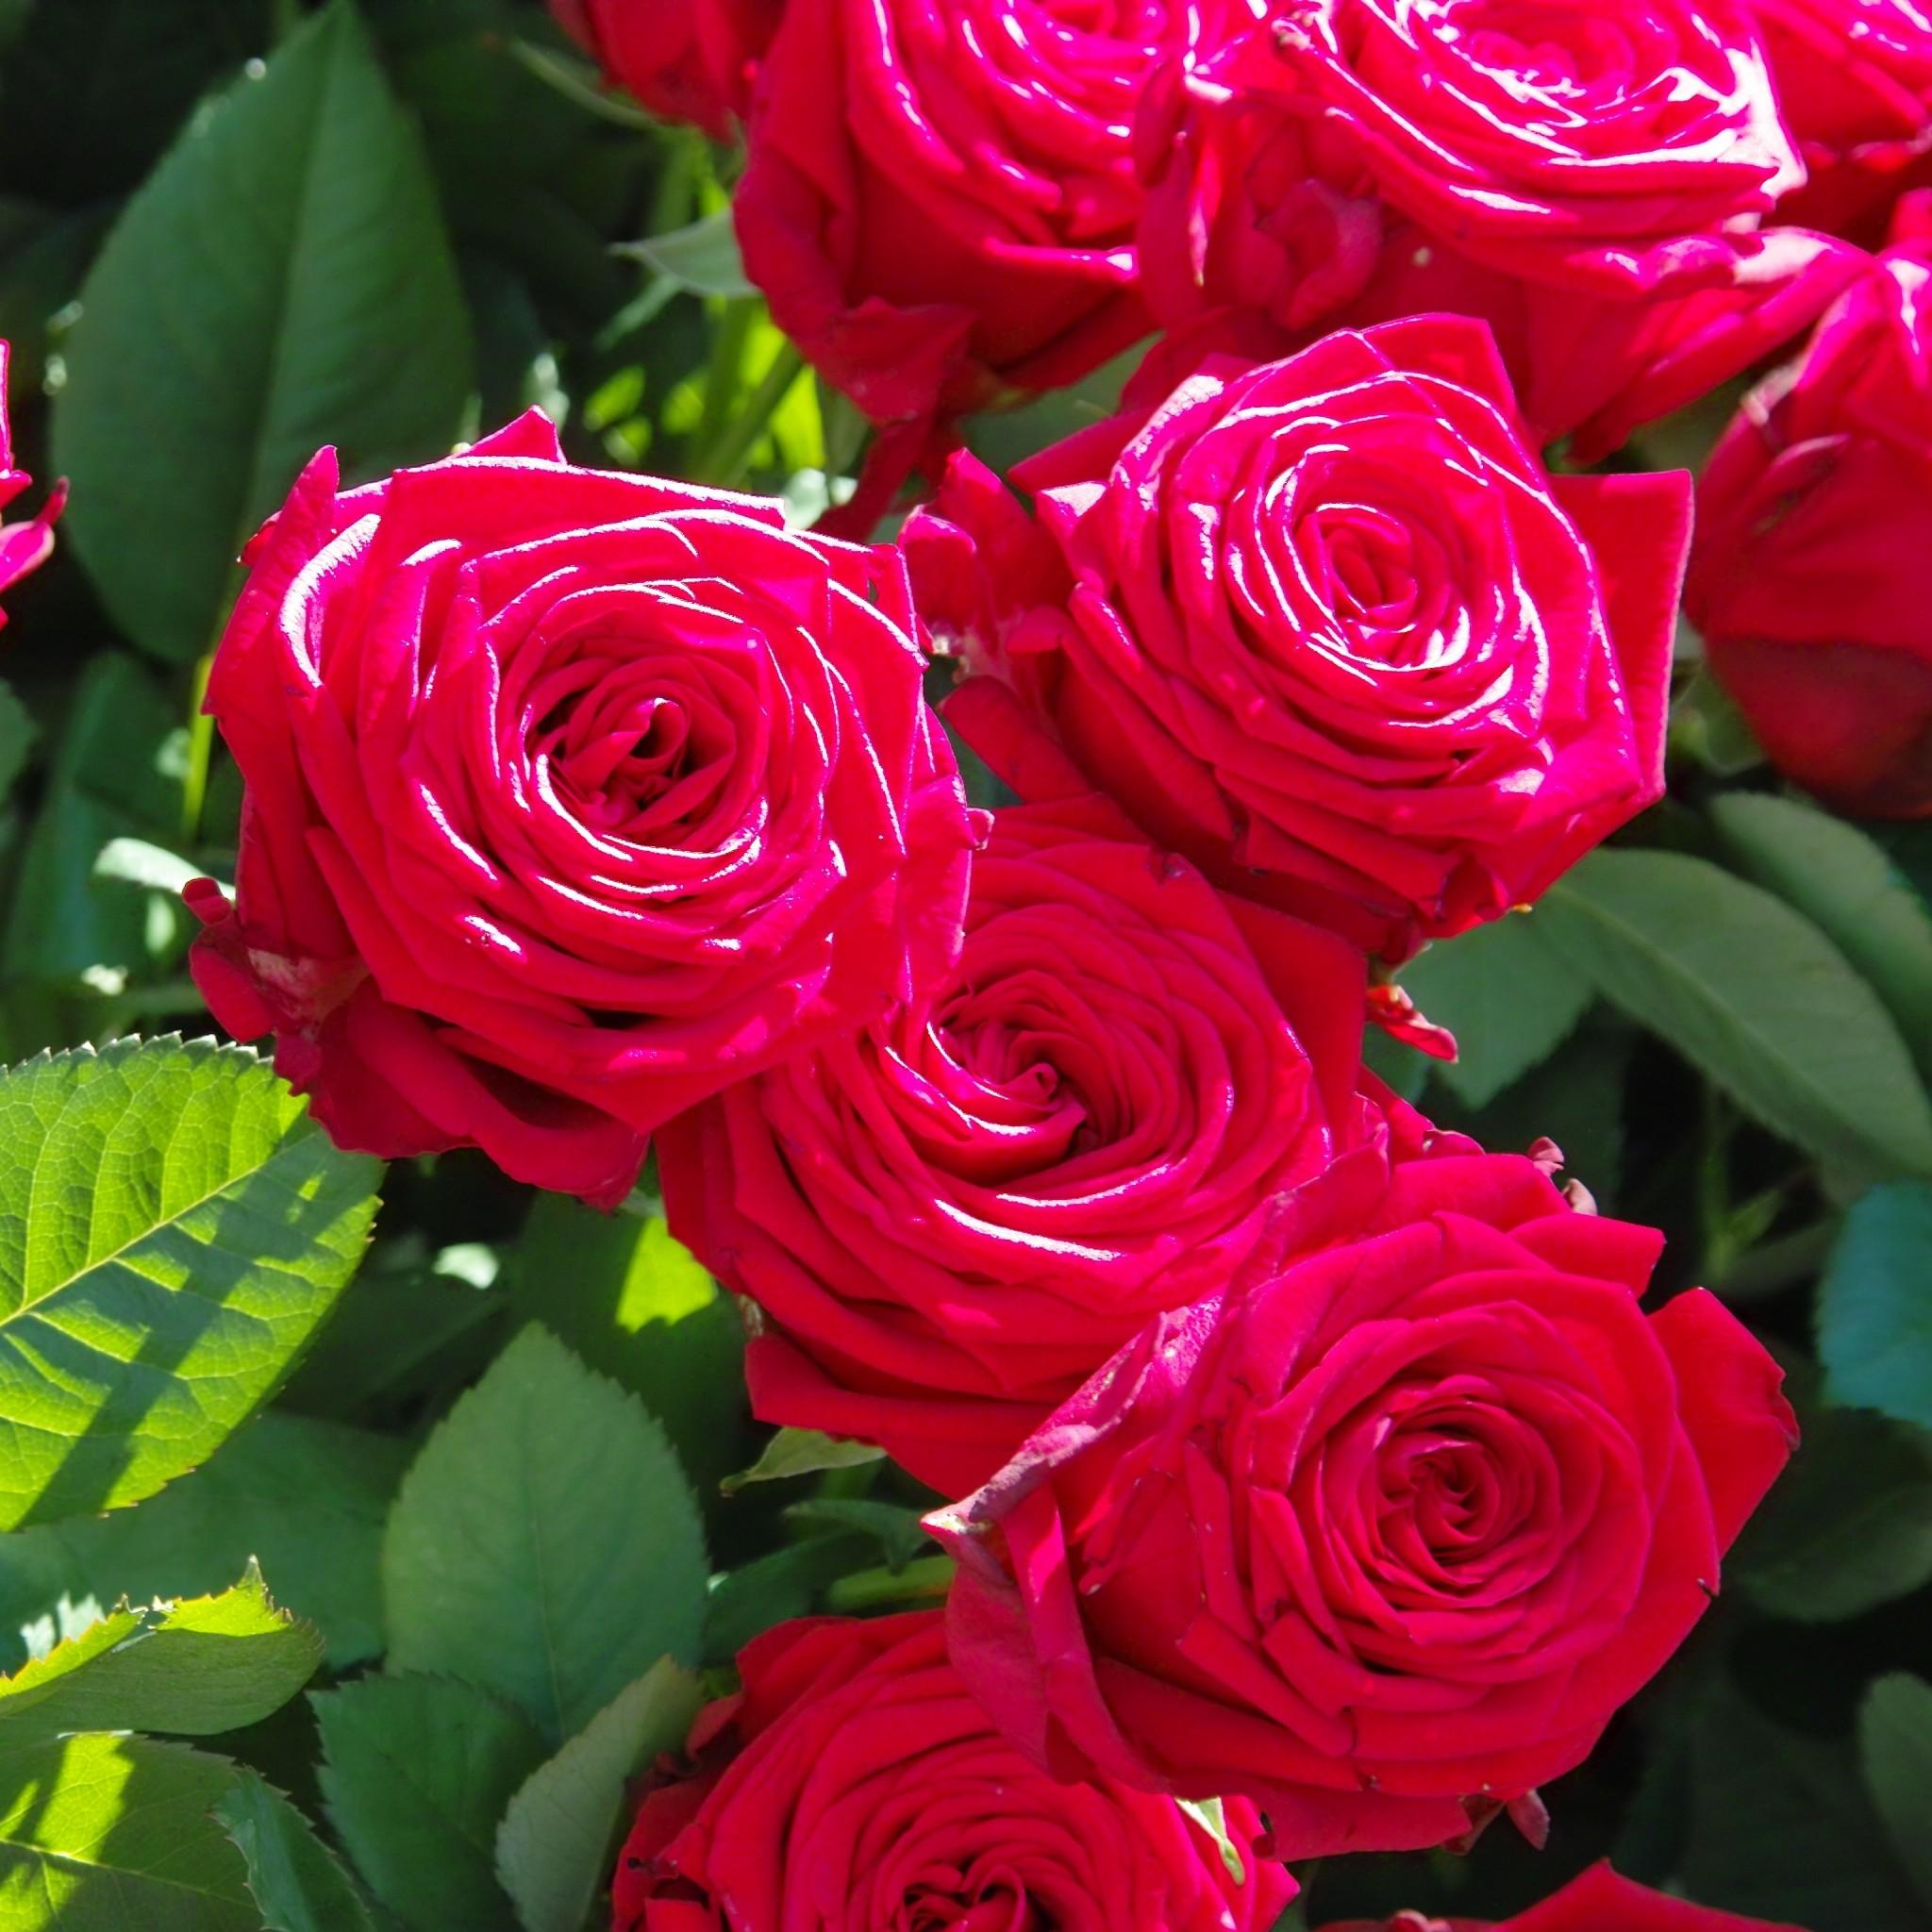 Rose Flowers Wallpaper (57+ Images